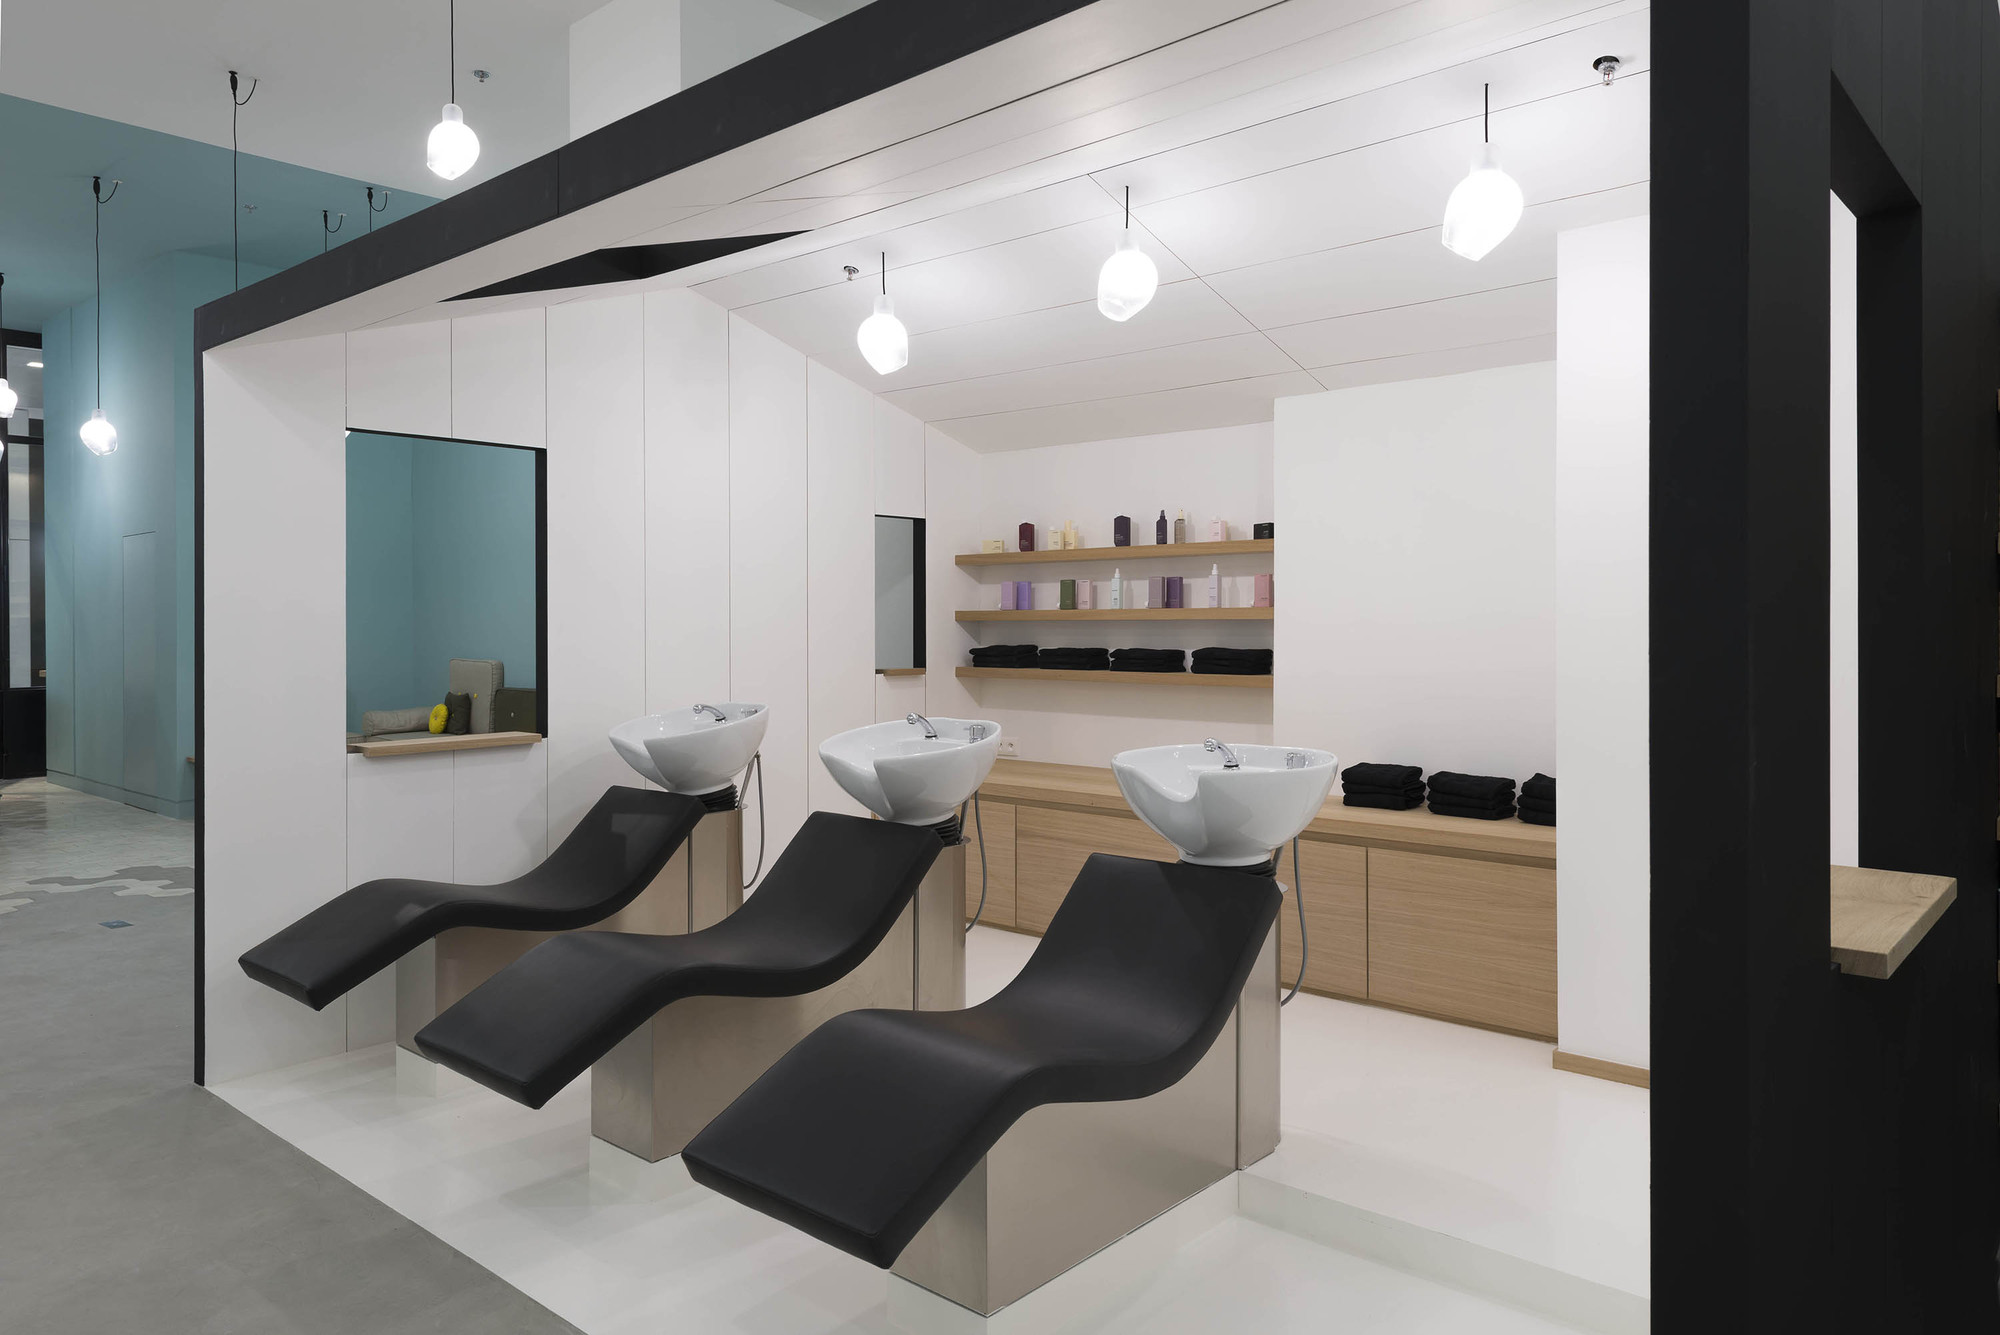 Gallery of Le Coiffeur / Margaux Keller Design Studio + Bertrand ...